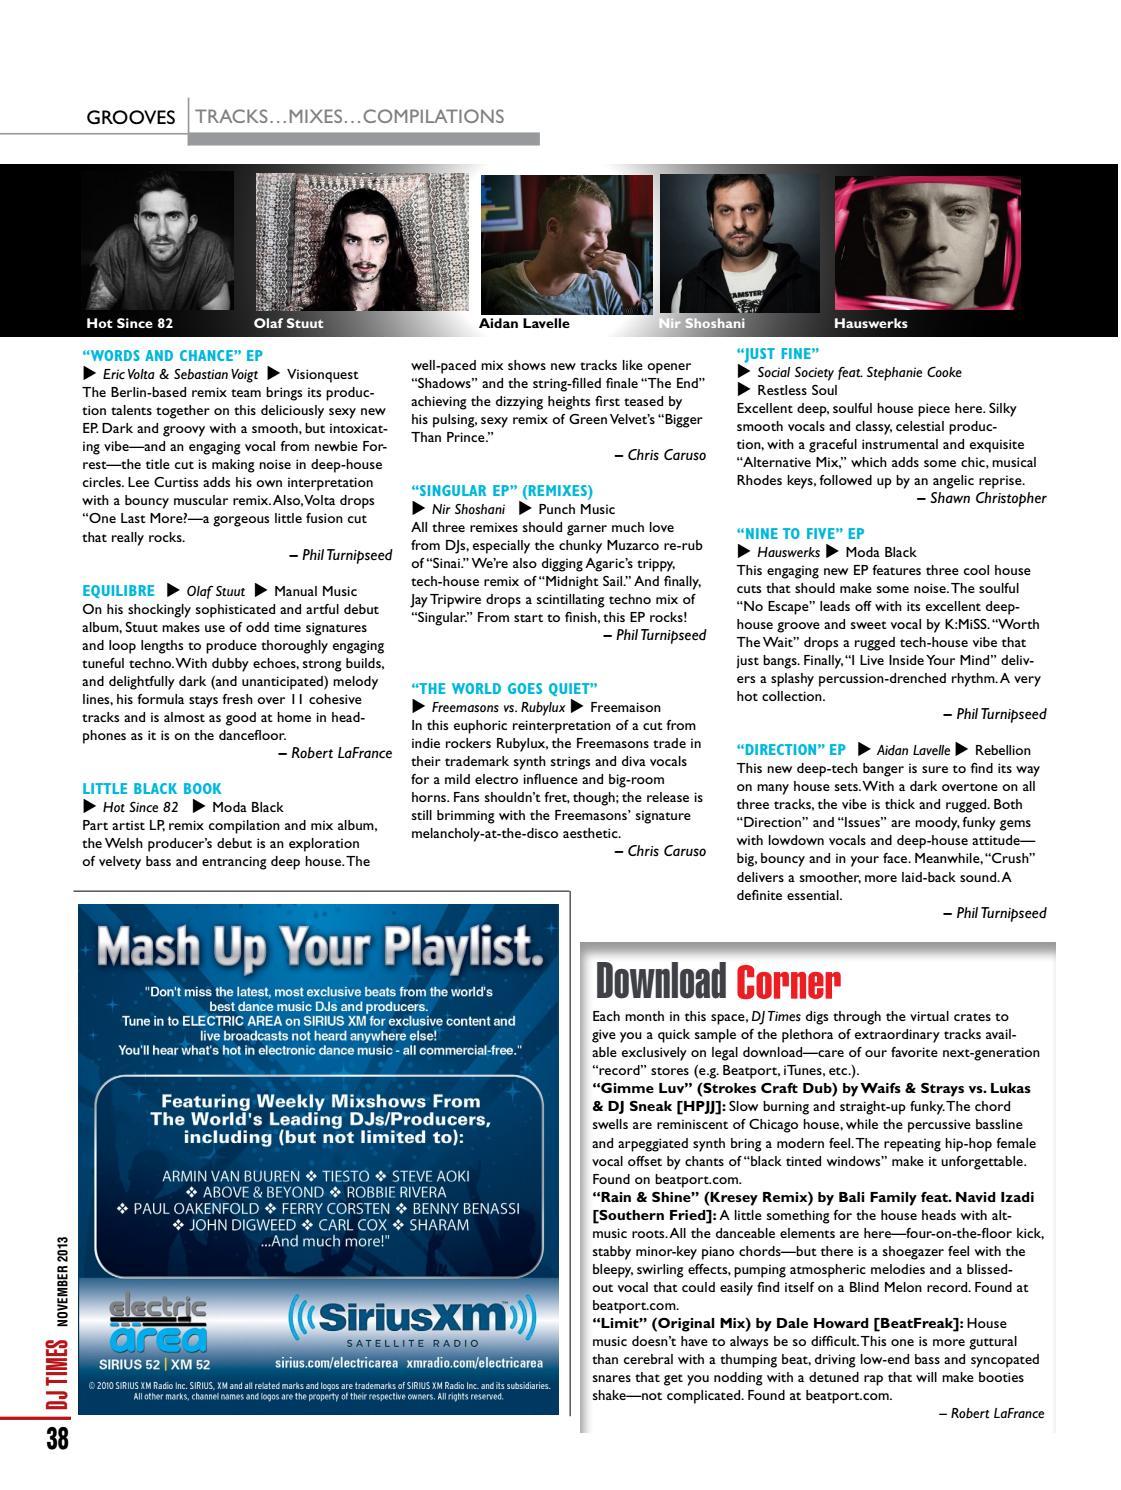 DJ Times November 2013, Vol 26 No 11 by DJ Times Magazine - issuu